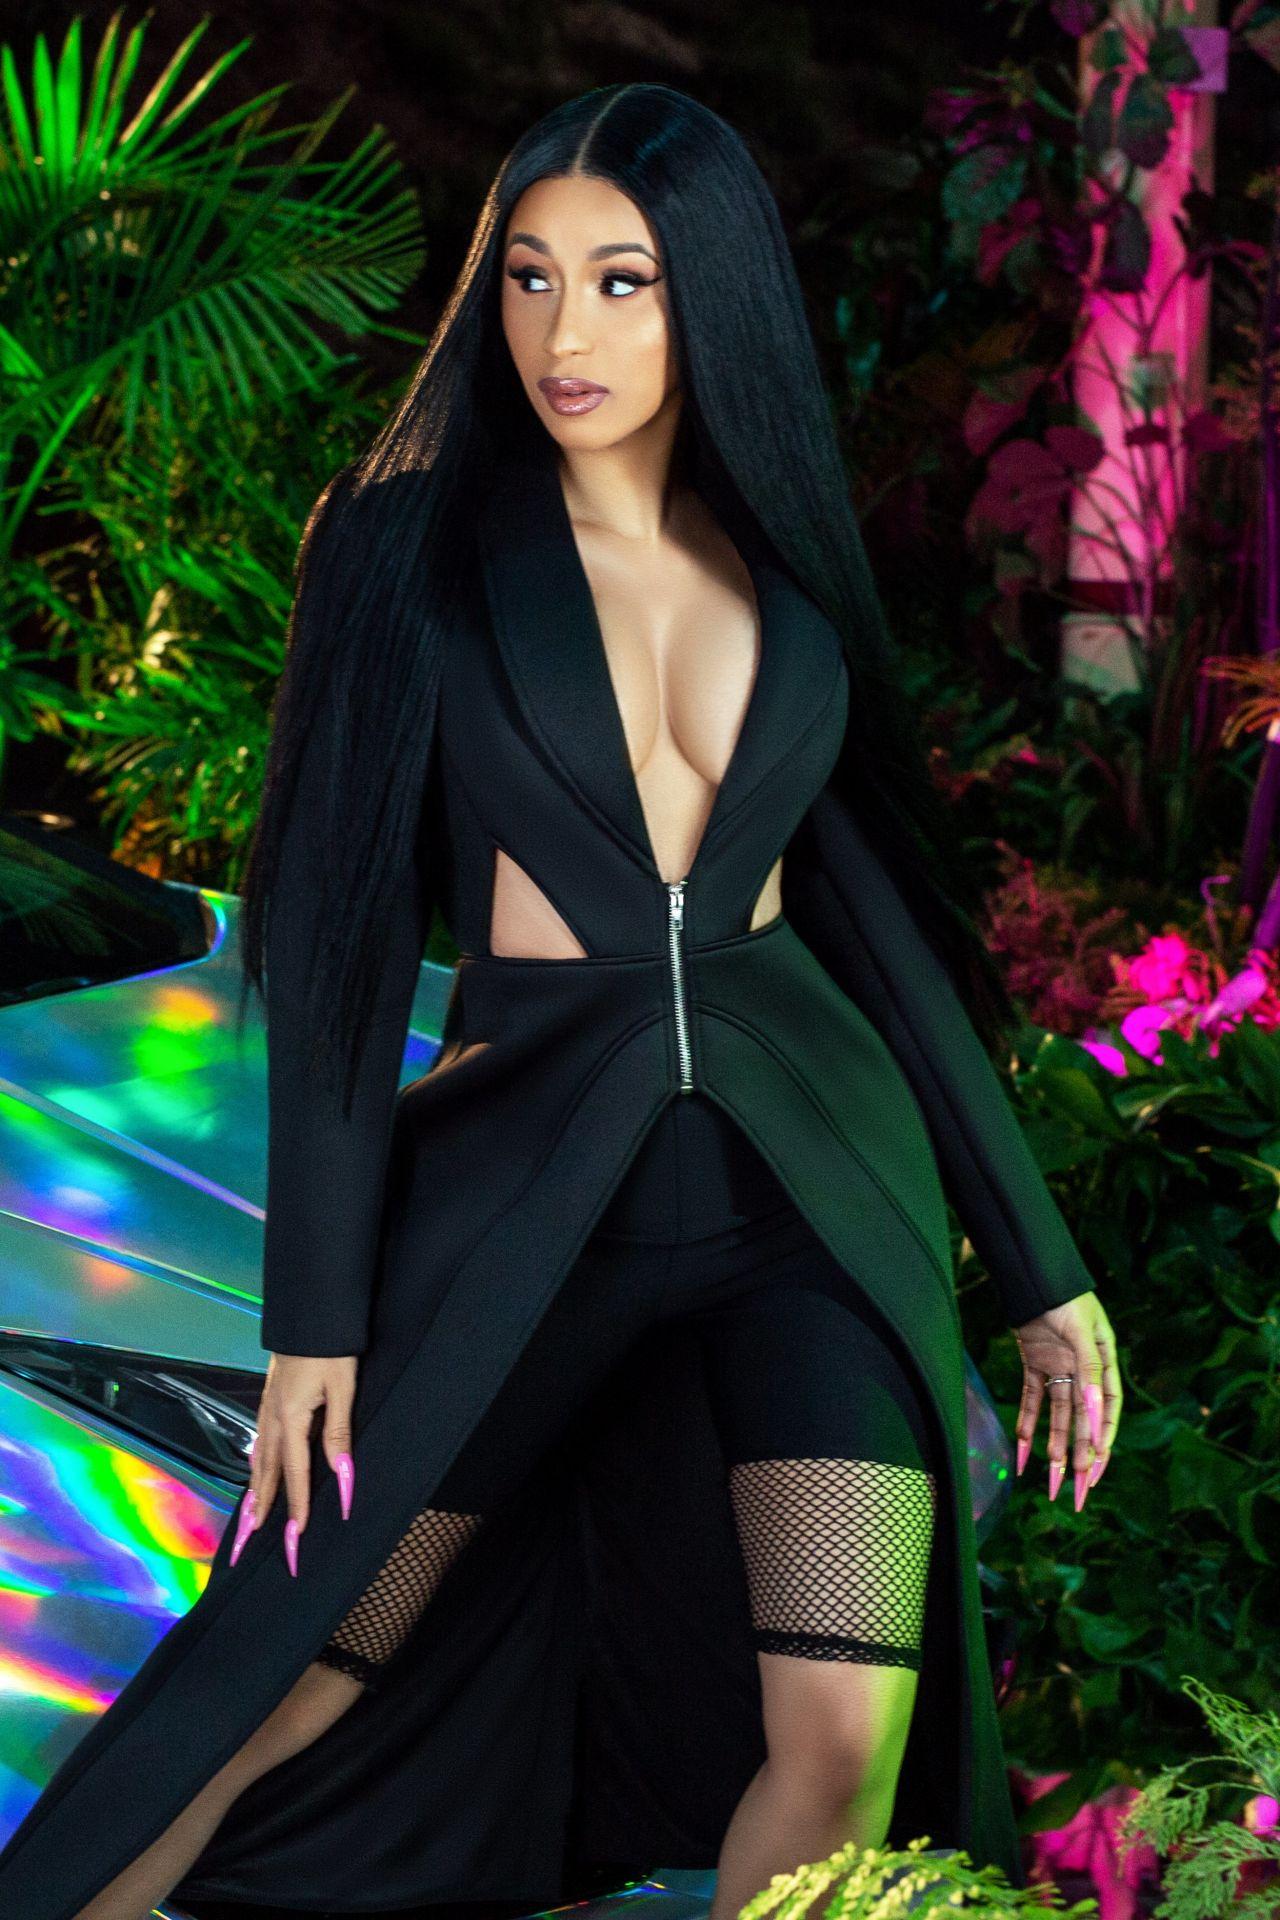 Cardi B Outfits: Fashion Nova Collection 2019